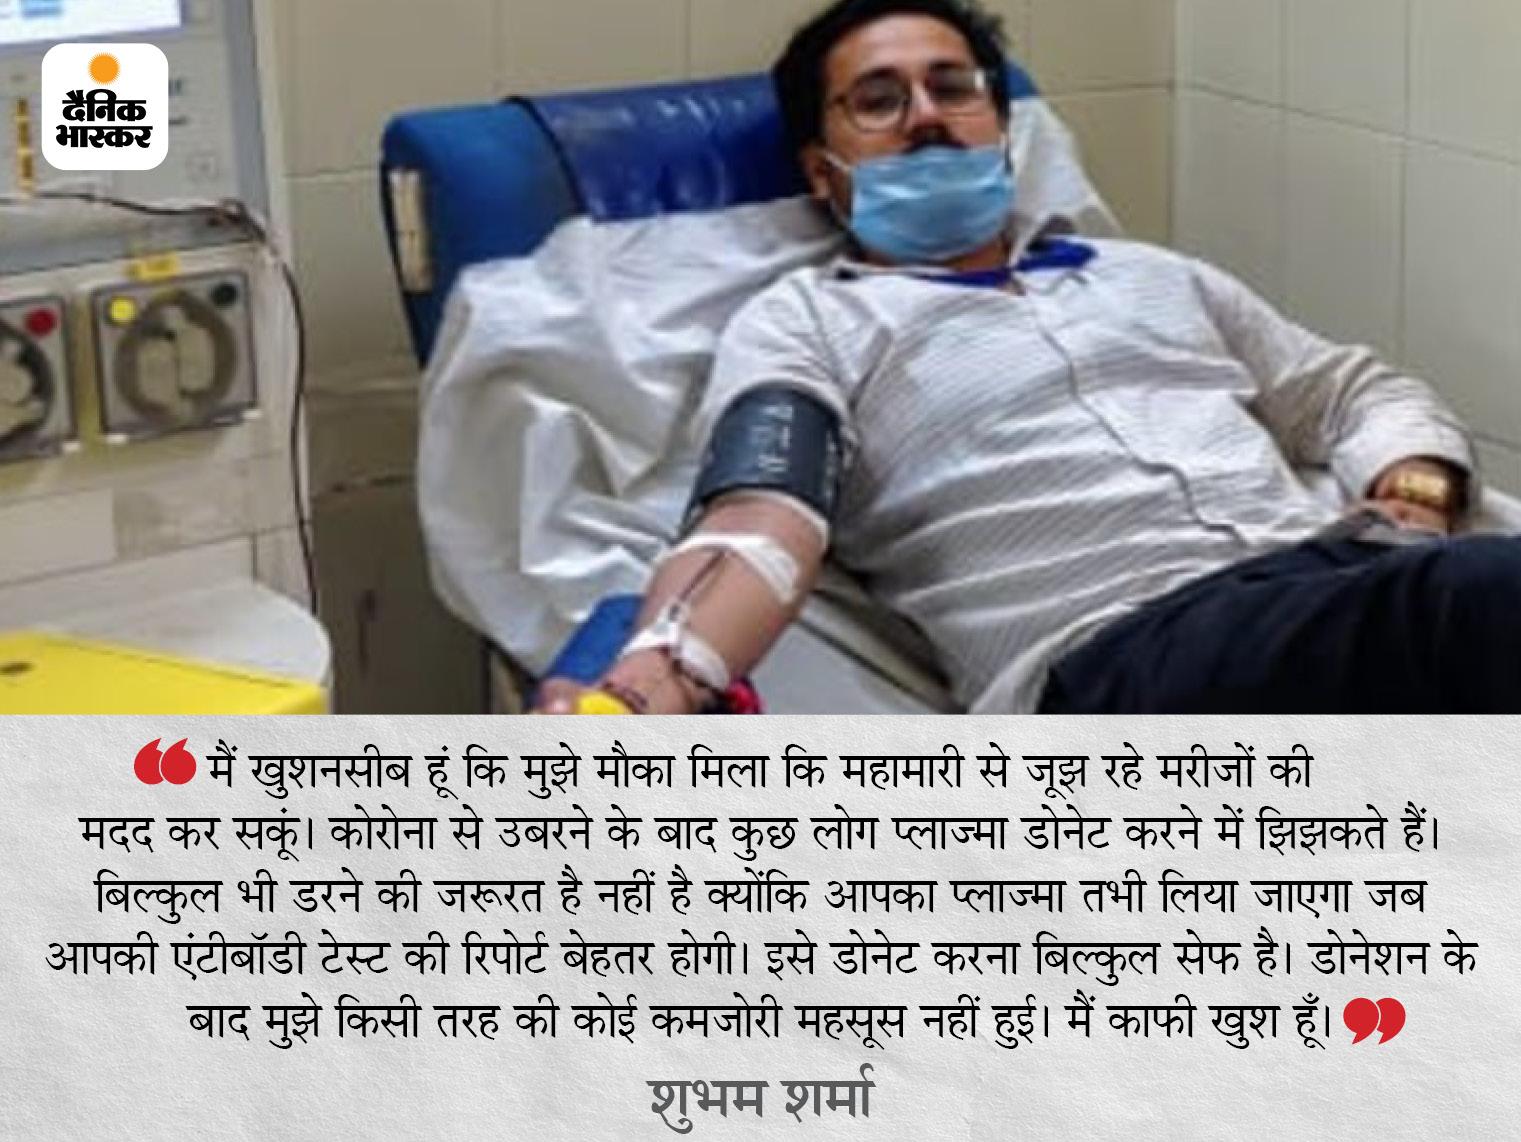 कोरोना से जीते शुभम ने प्लाज्मा डोनेट कर दो मरीजों की बचाई जान, बोले- यह मेरी खुशनसीबी|नागौर,Nagaur - Dainik Bhaskar